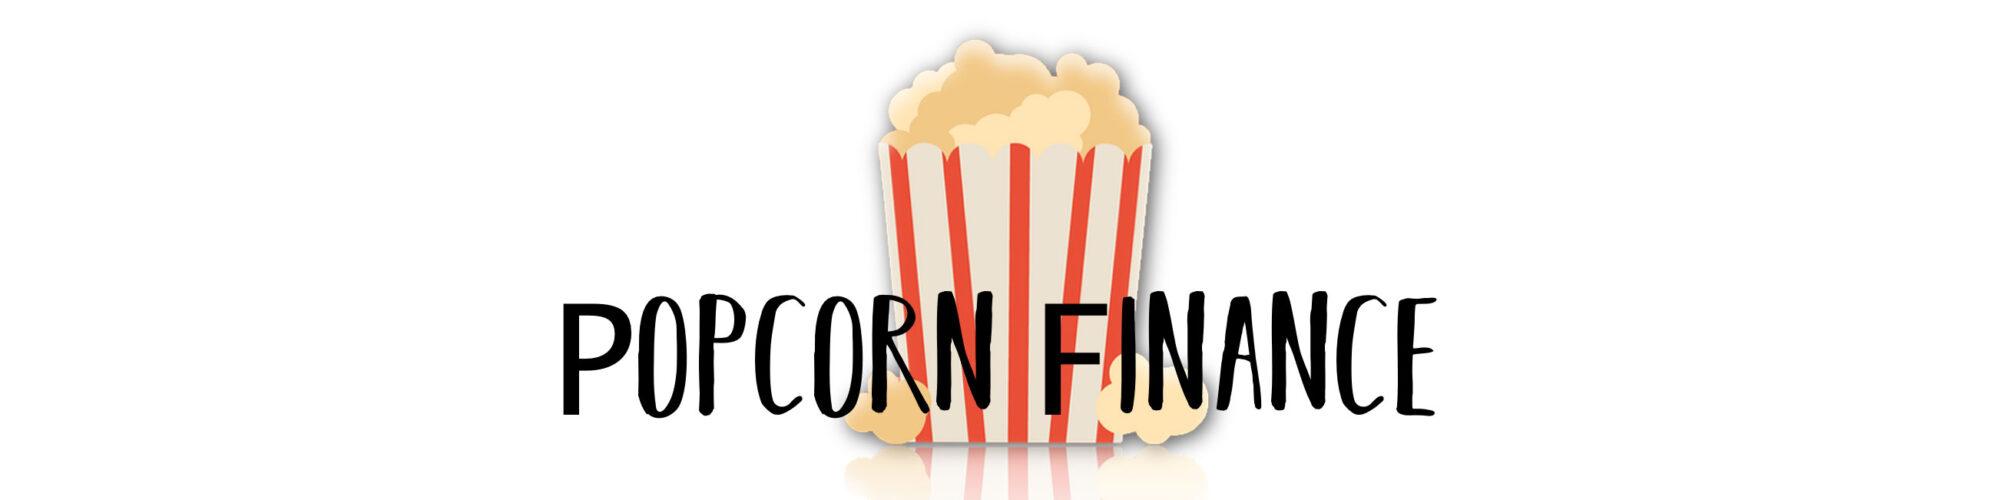 Popcorn Finance